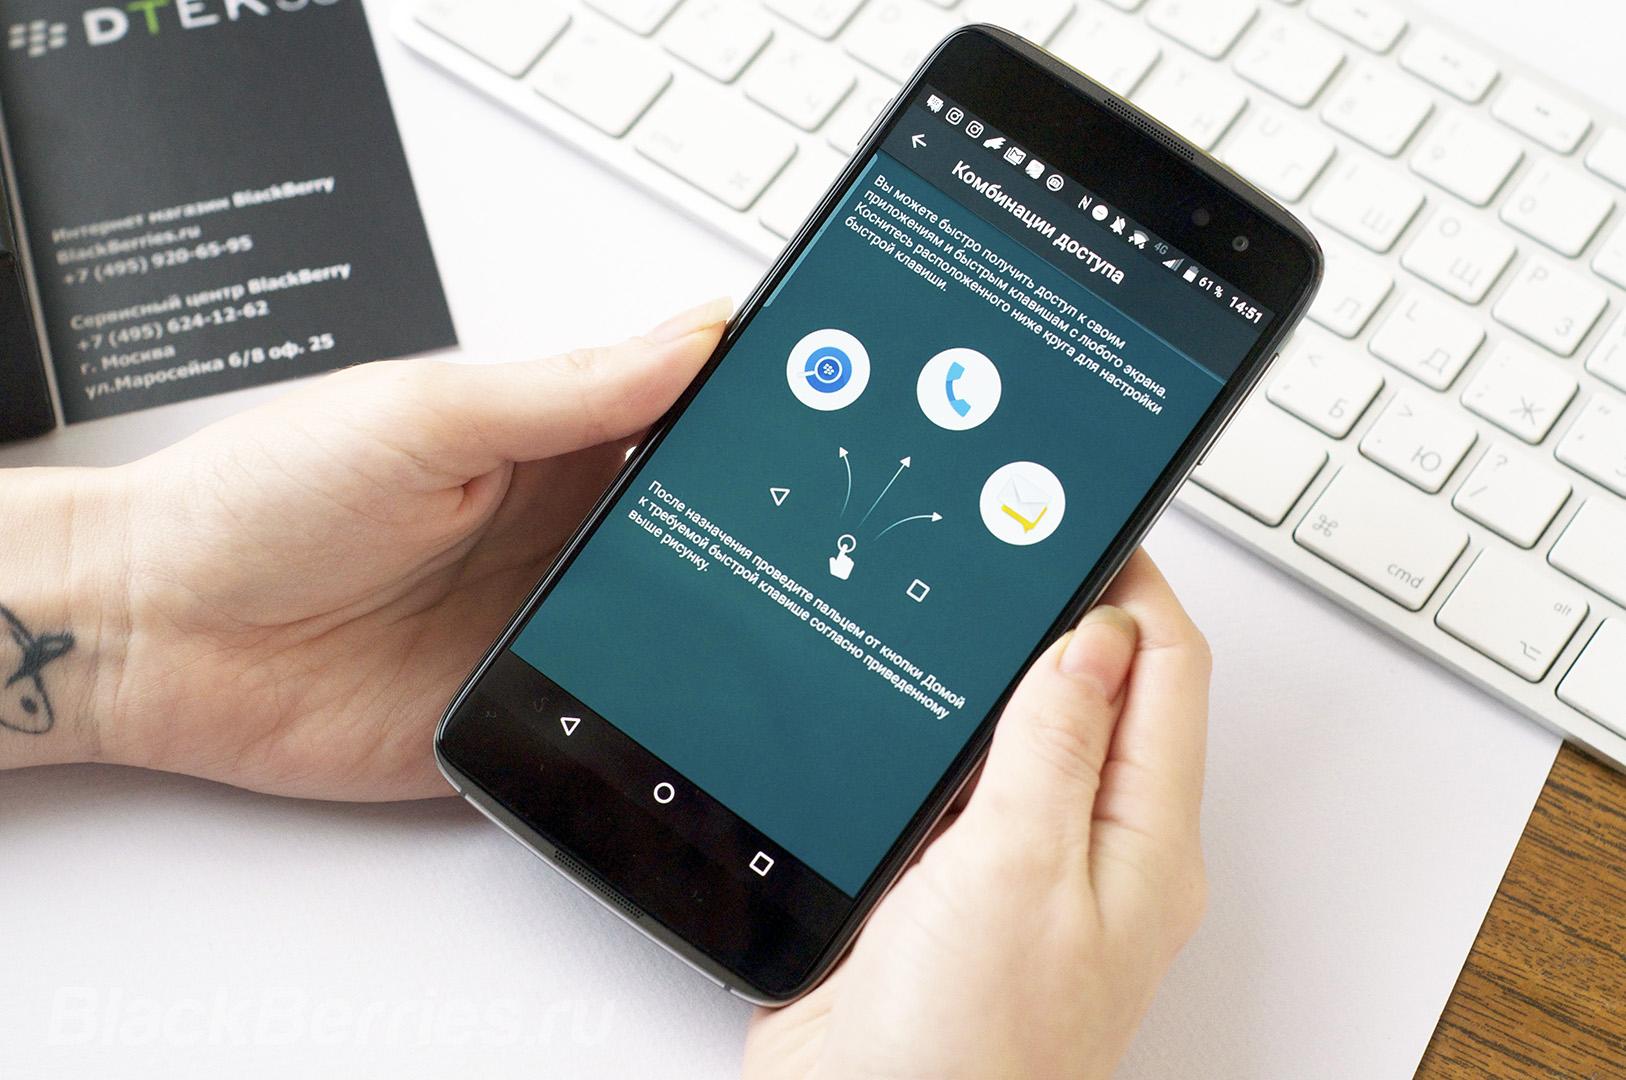 blackberry-dtek60-review-18